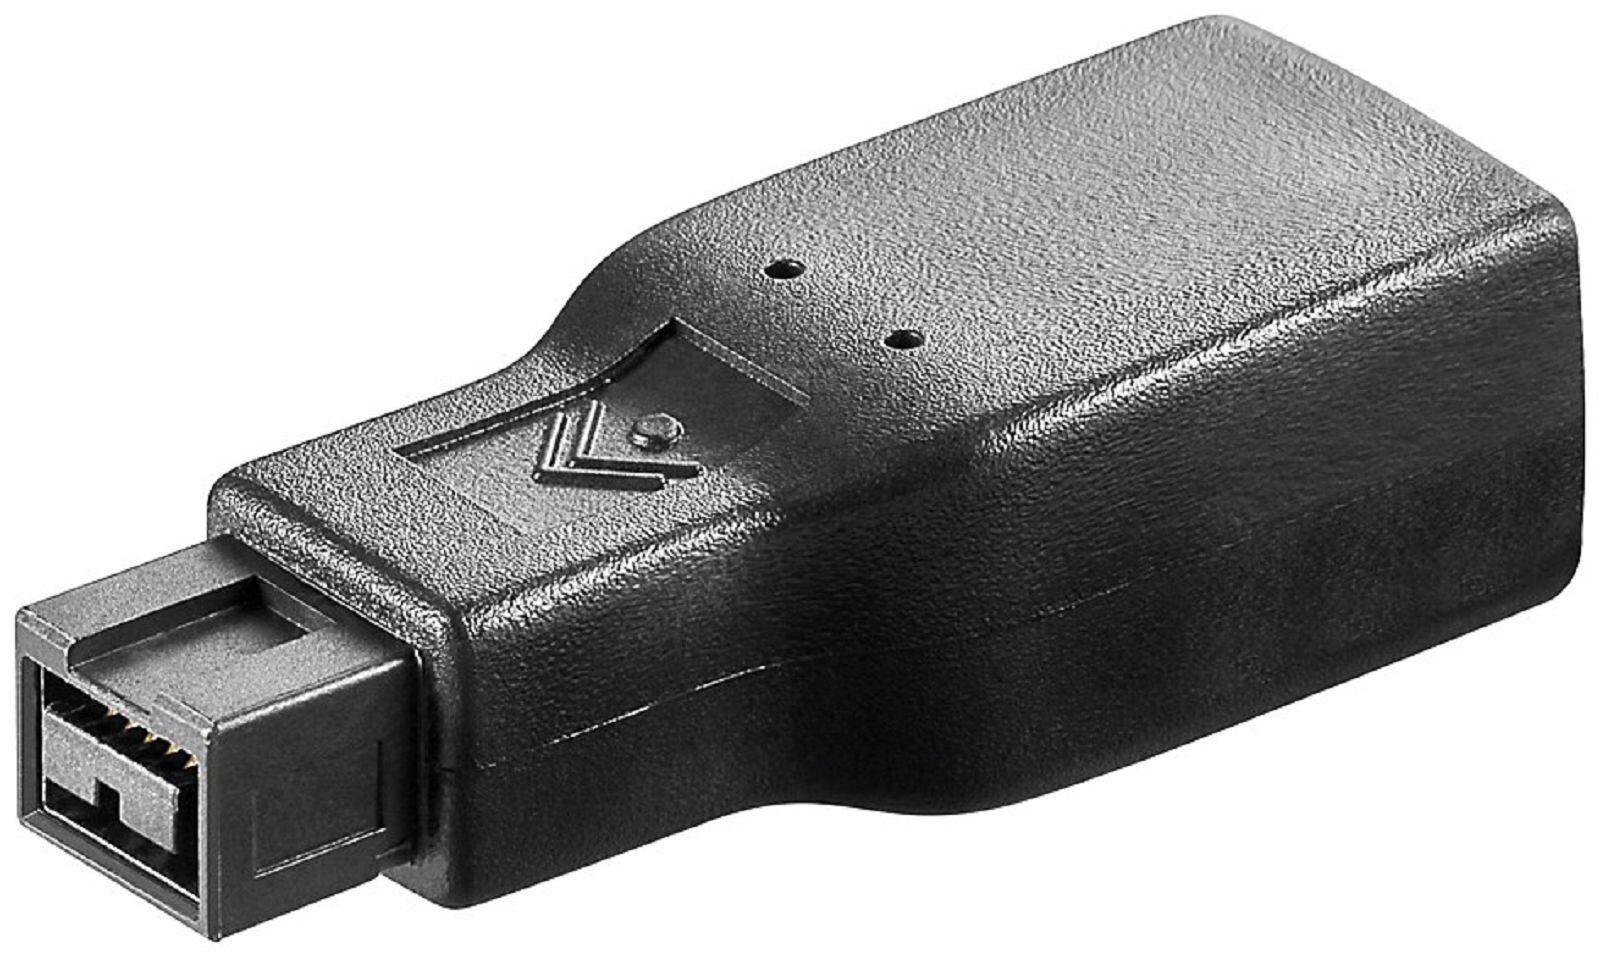 Firewire Adapter 6pol Socket On 9pol Plug #o486